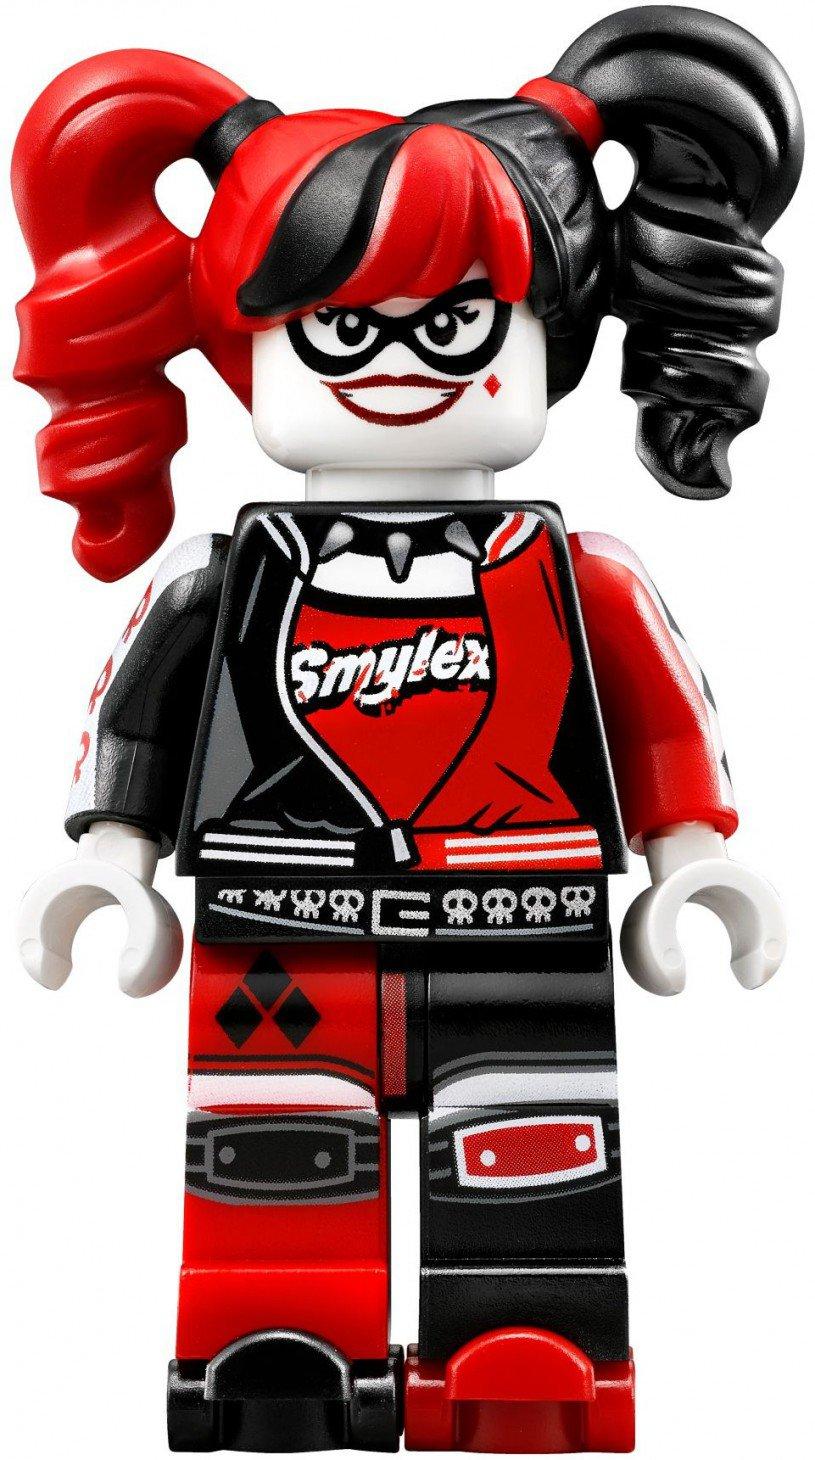 LEGO Minifigure Harley Quinn